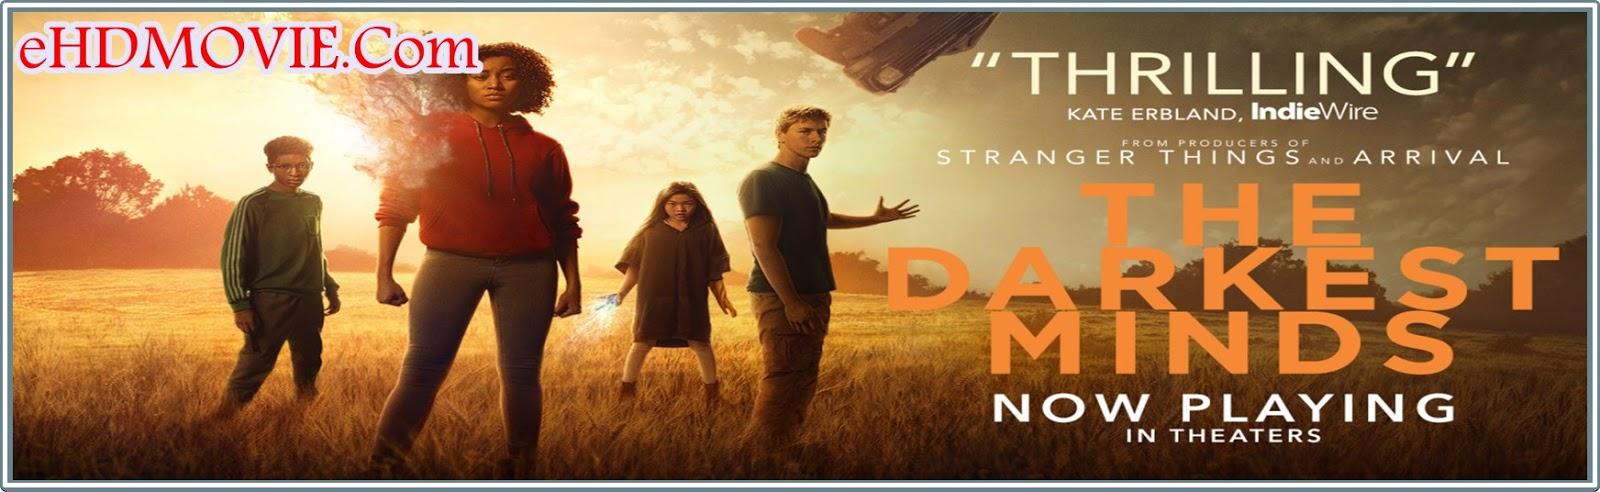 The Darkest Minds 2018 Full Movie English 720p - 480p ORG BRRip 350MB - 750MB ESubs Free Download